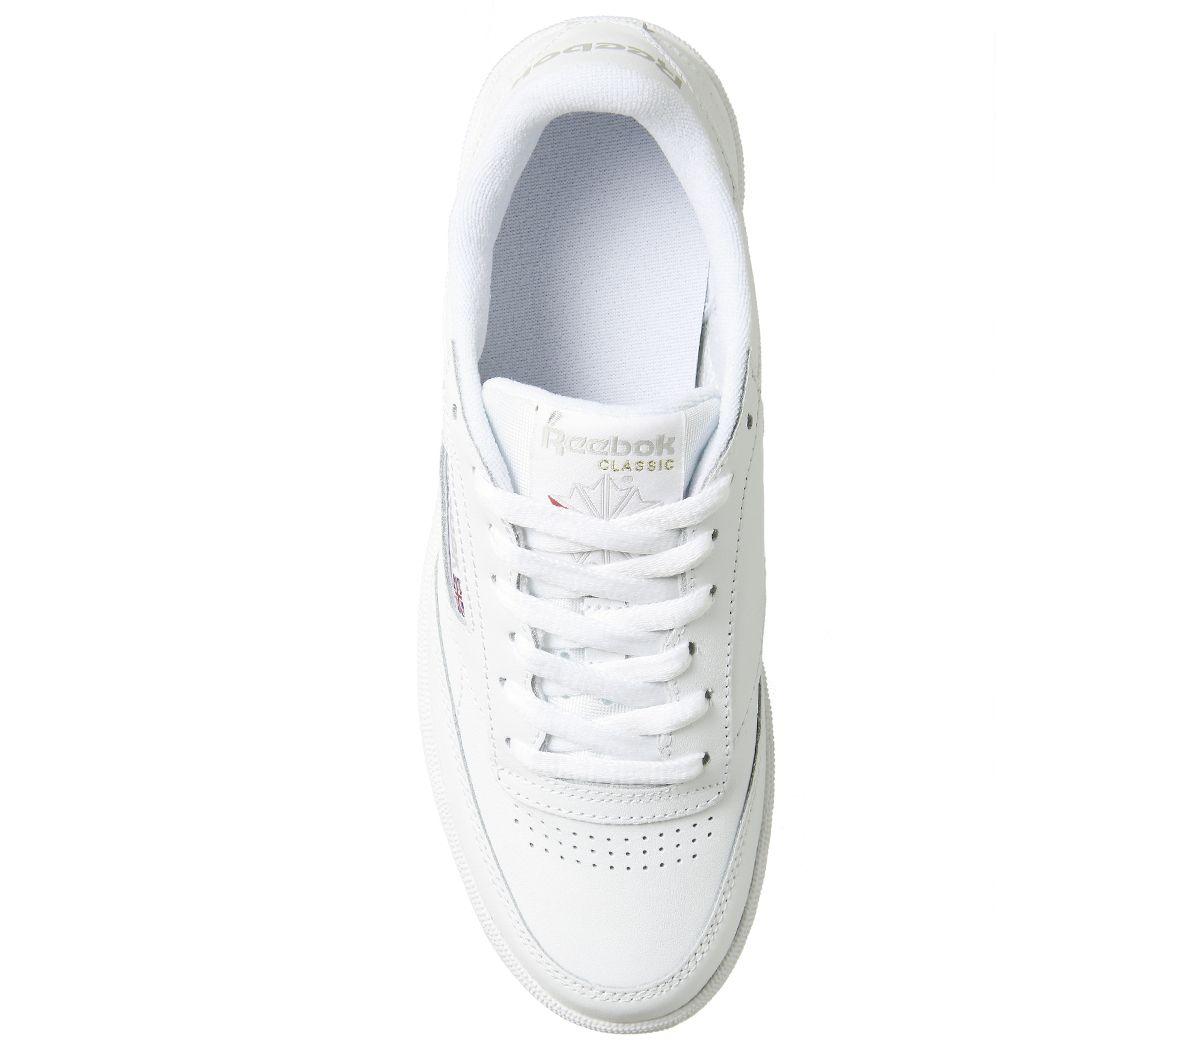 Haut-femme-Reebok-Club-C-85-Baskets-Gris-Blanc-Gomme-Baskets-Chaussures miniature 12